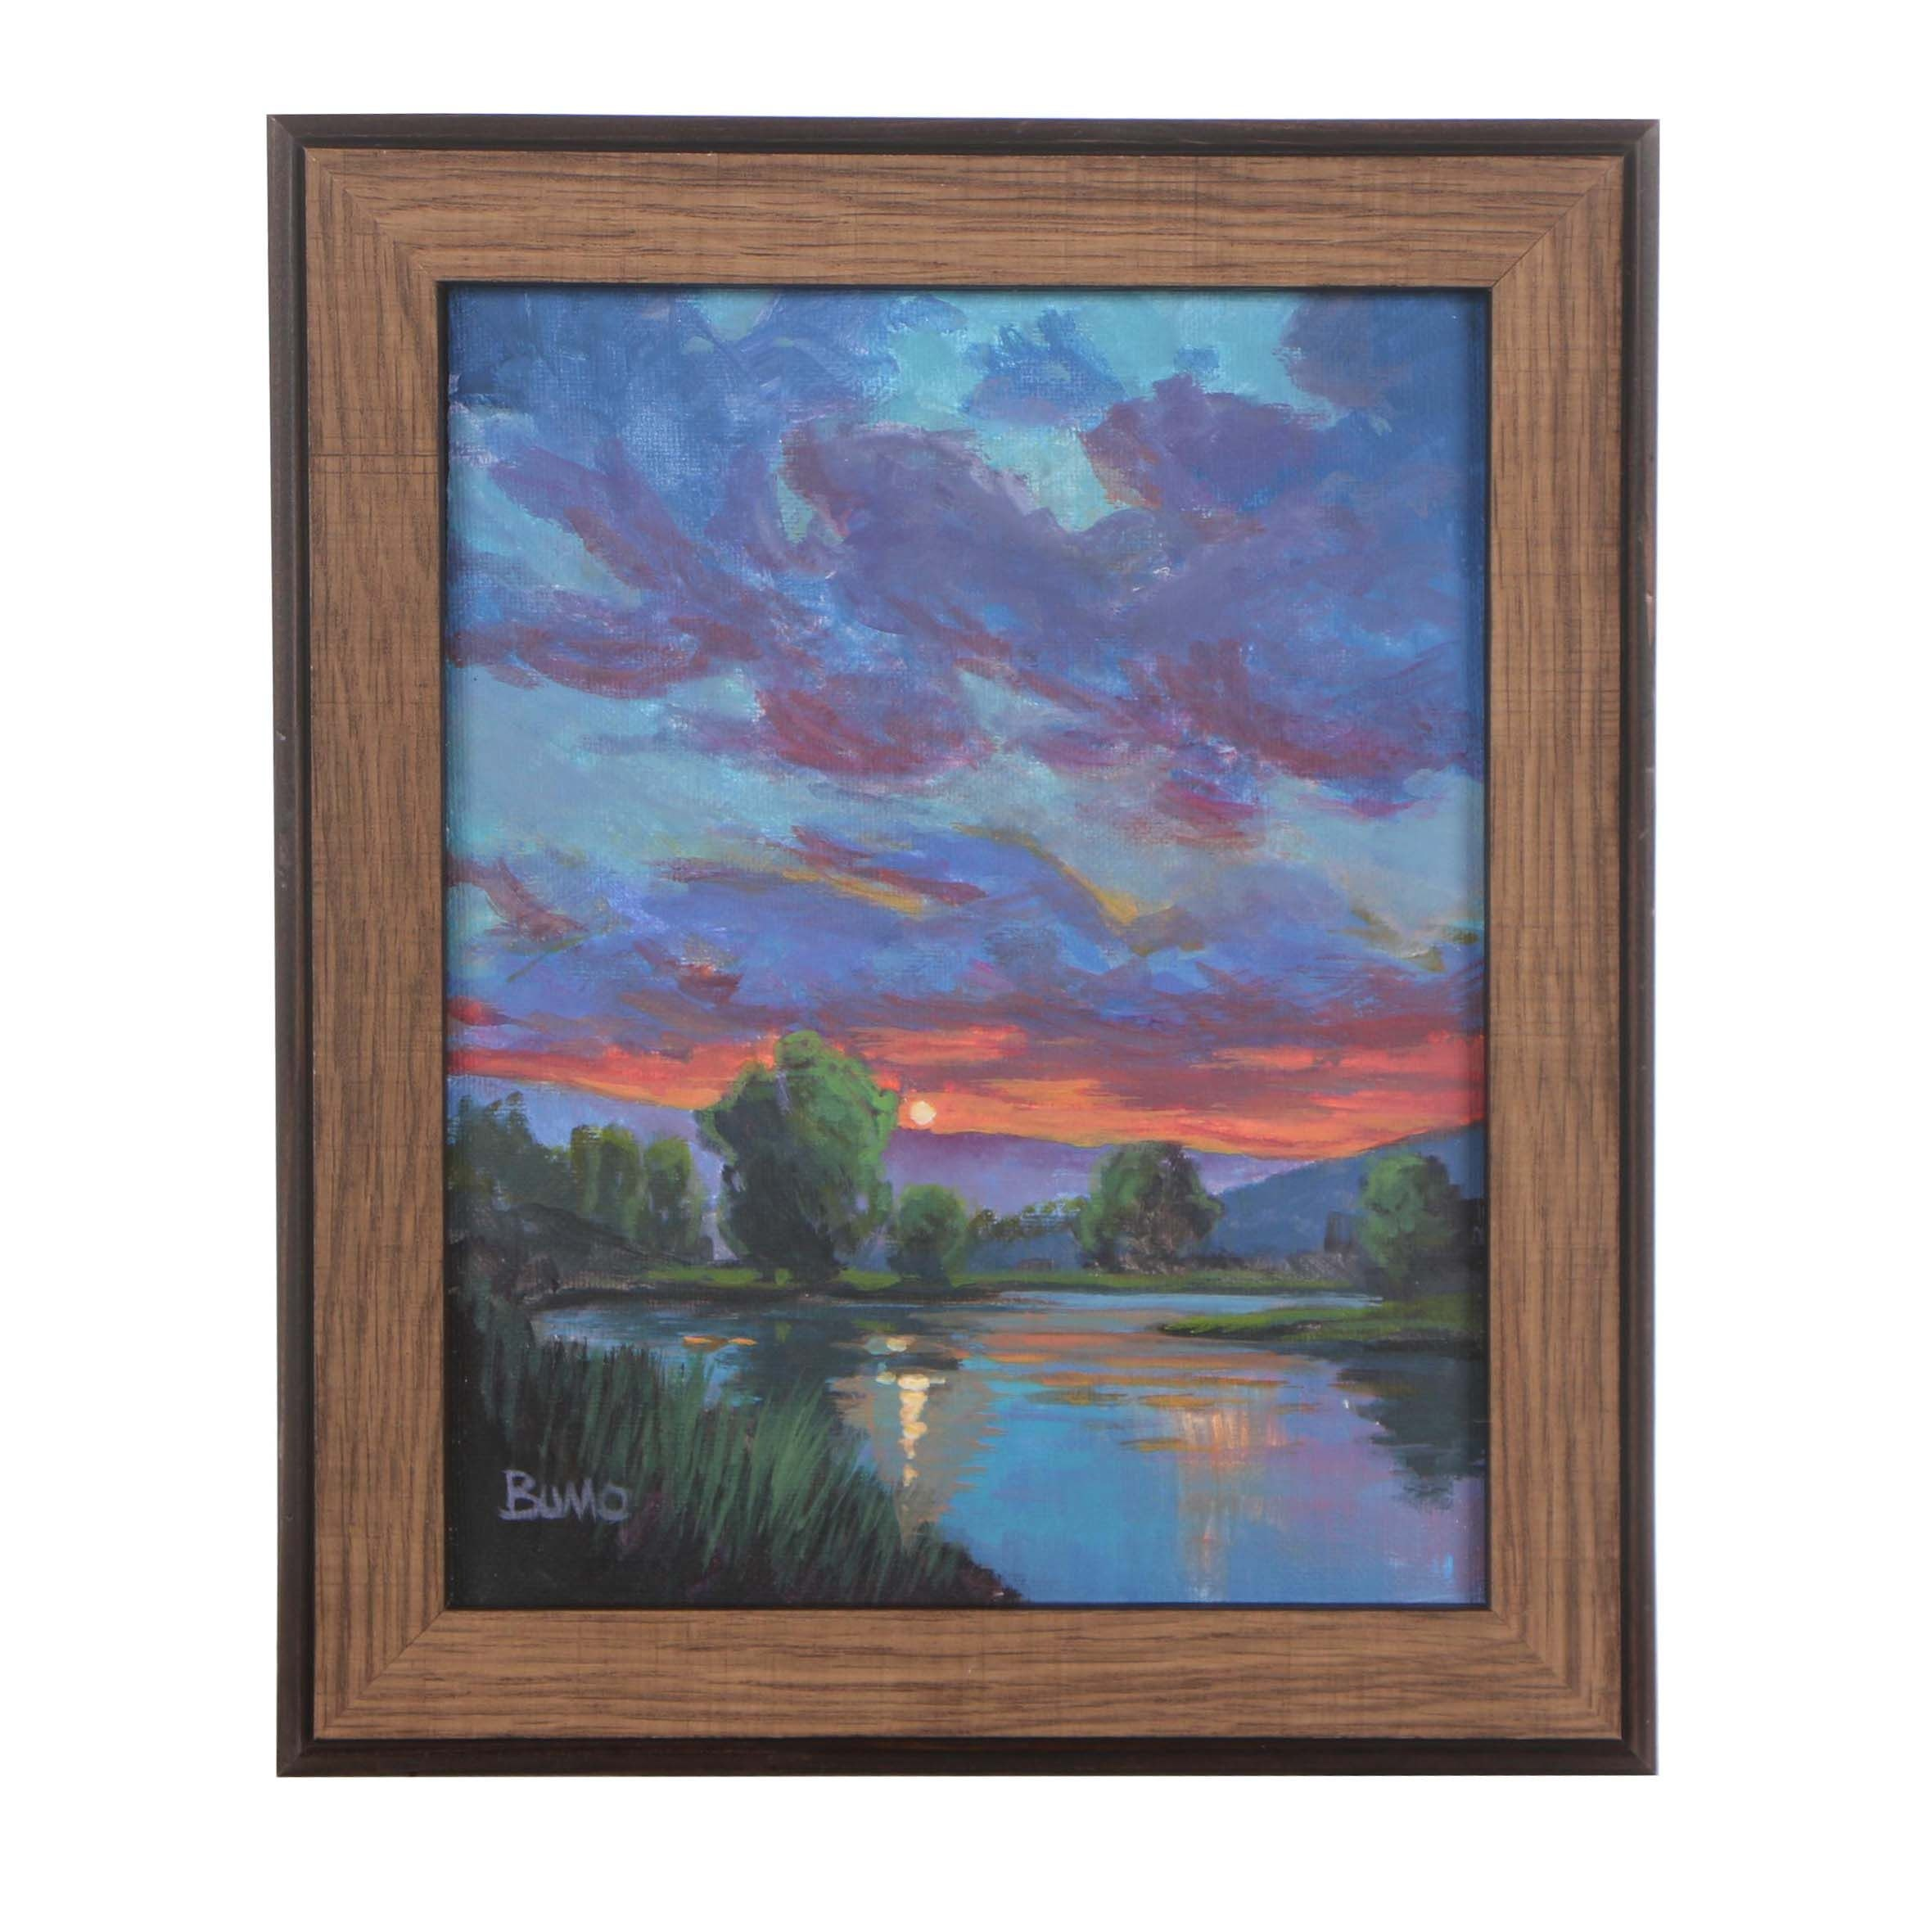 "Douglas Bumo Johnpeer Oil Painting ""Before The Rain"""